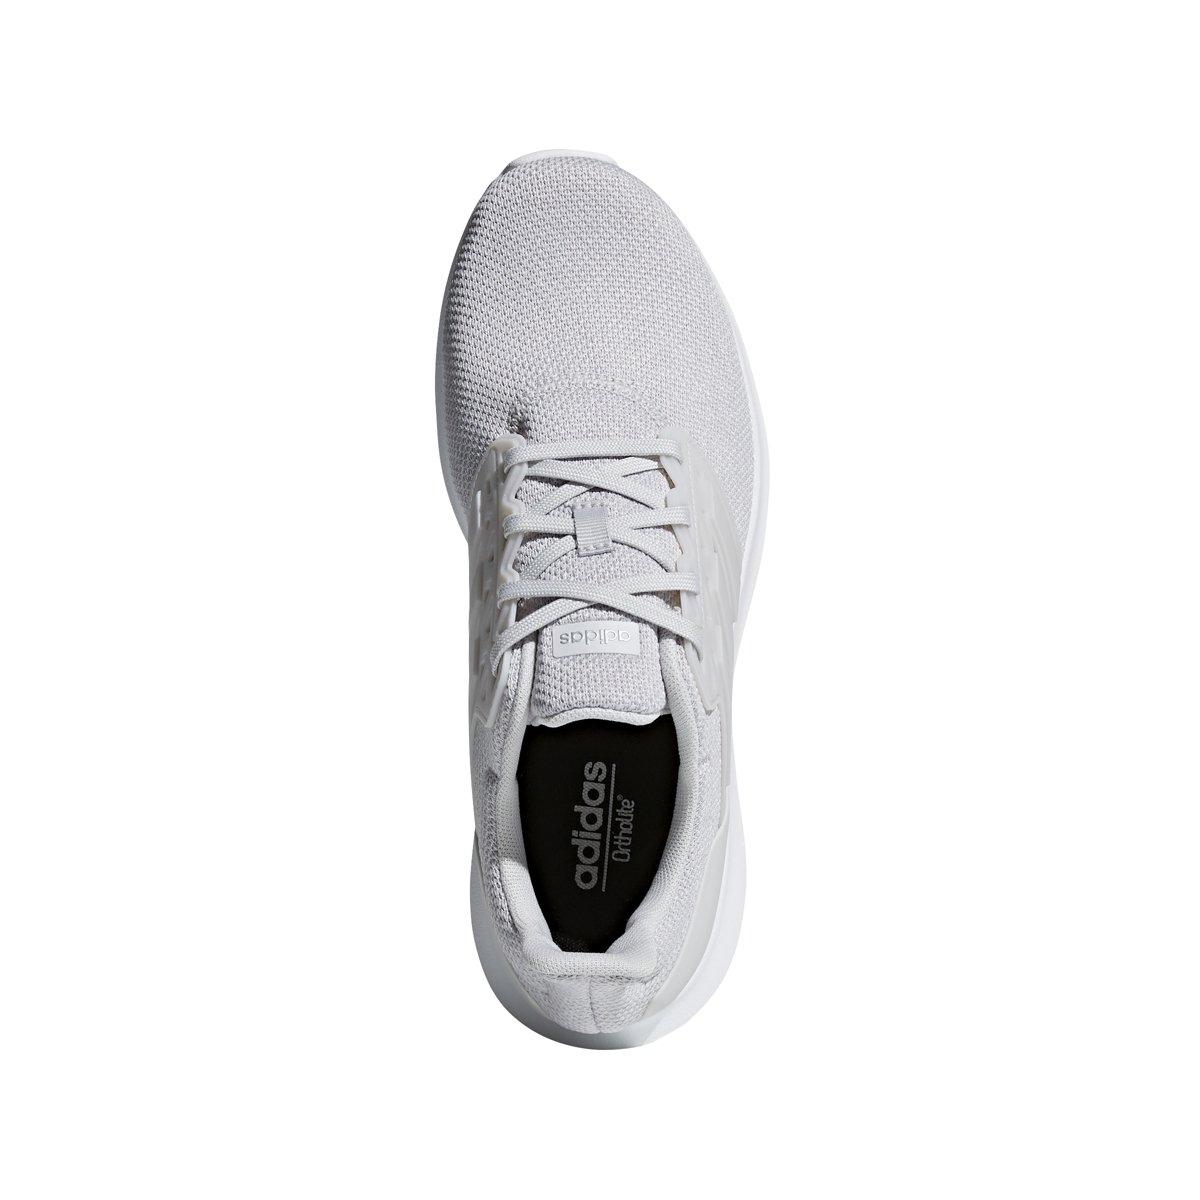 adidas Originals - Solyx Homme Grey/Grey/Light Granite